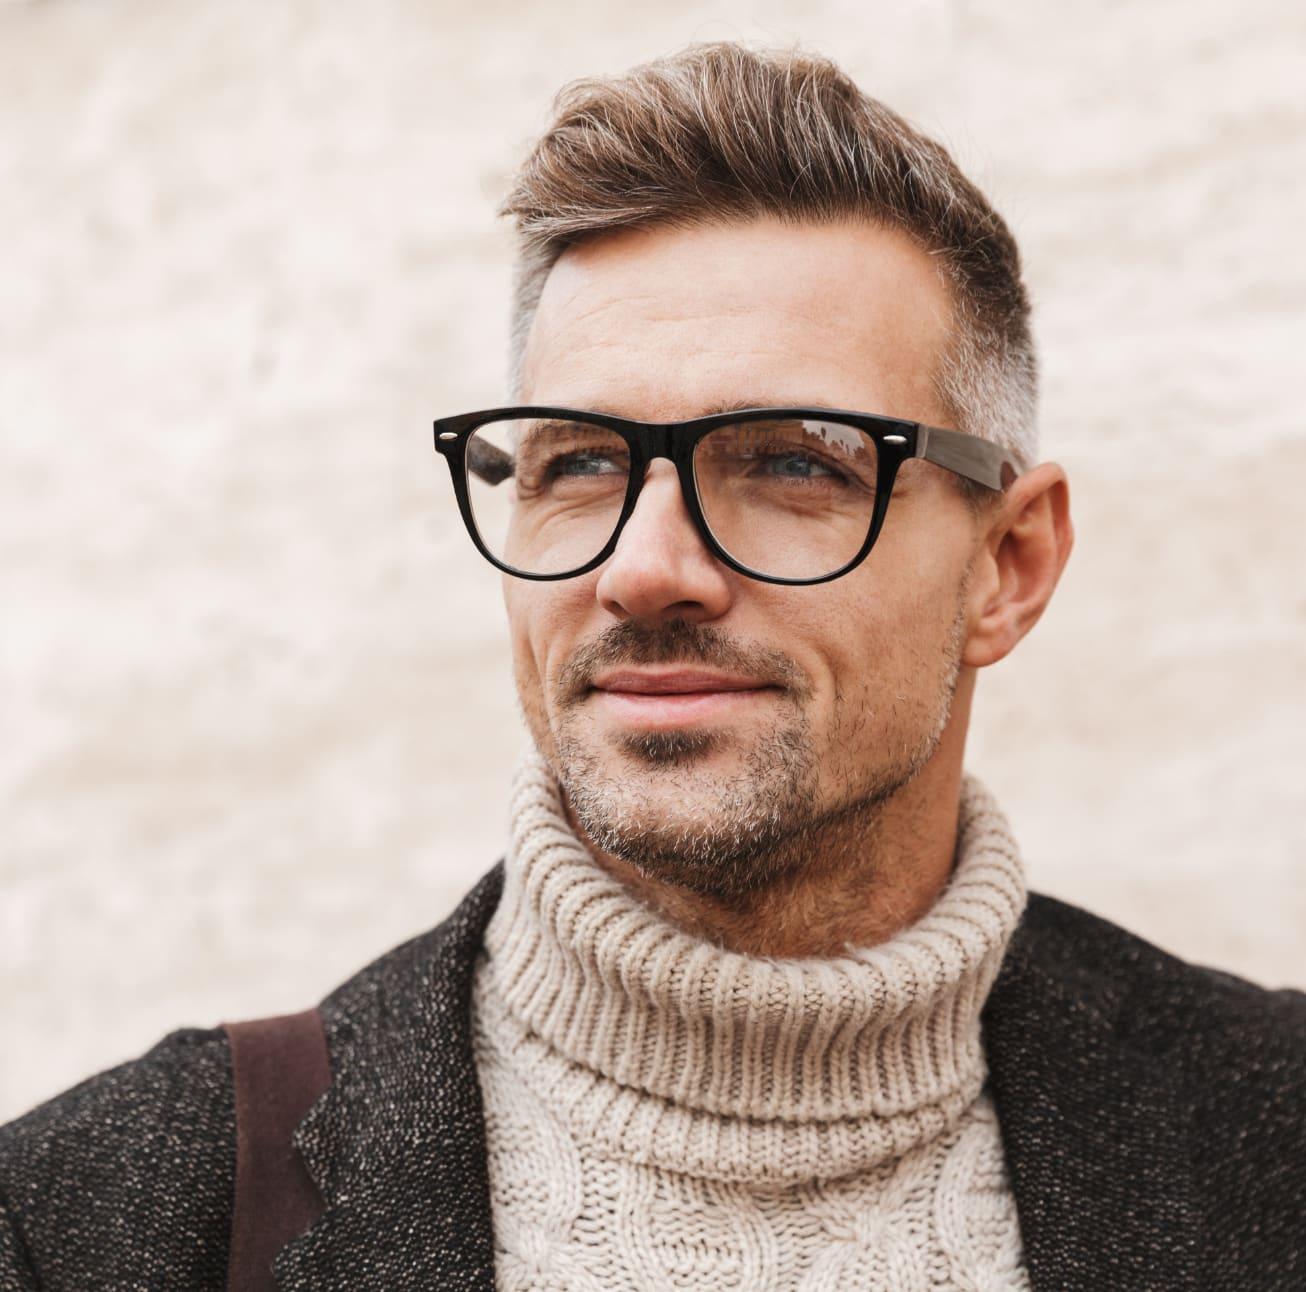 Stylish older man wearing glasses and a turtleneck sweater under a blazer